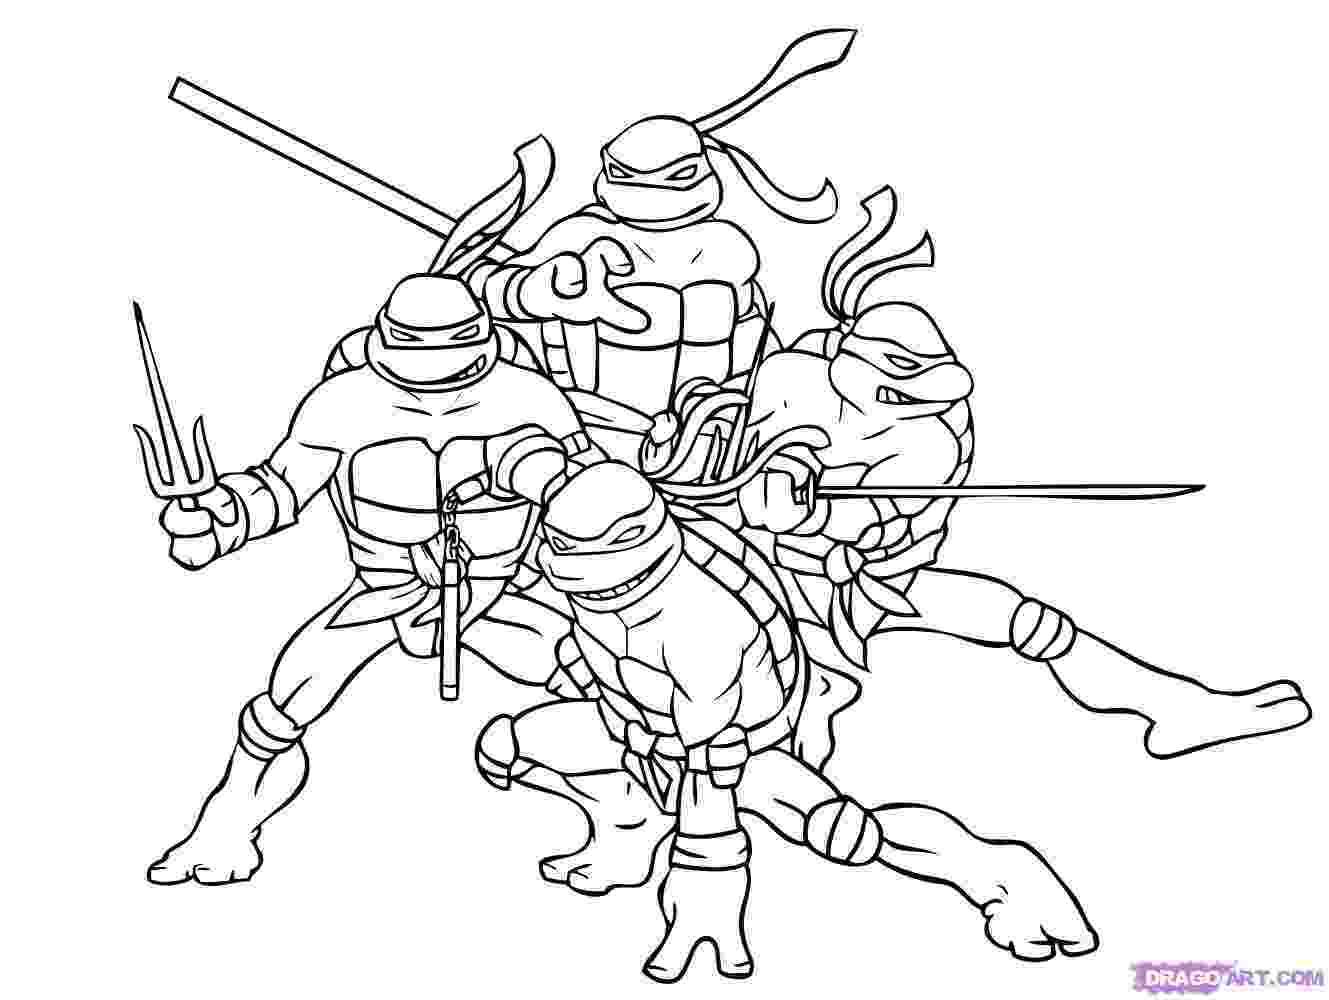 ninja turtle colouring page ninja turtle coloring pages free printable pictures colouring ninja turtle page